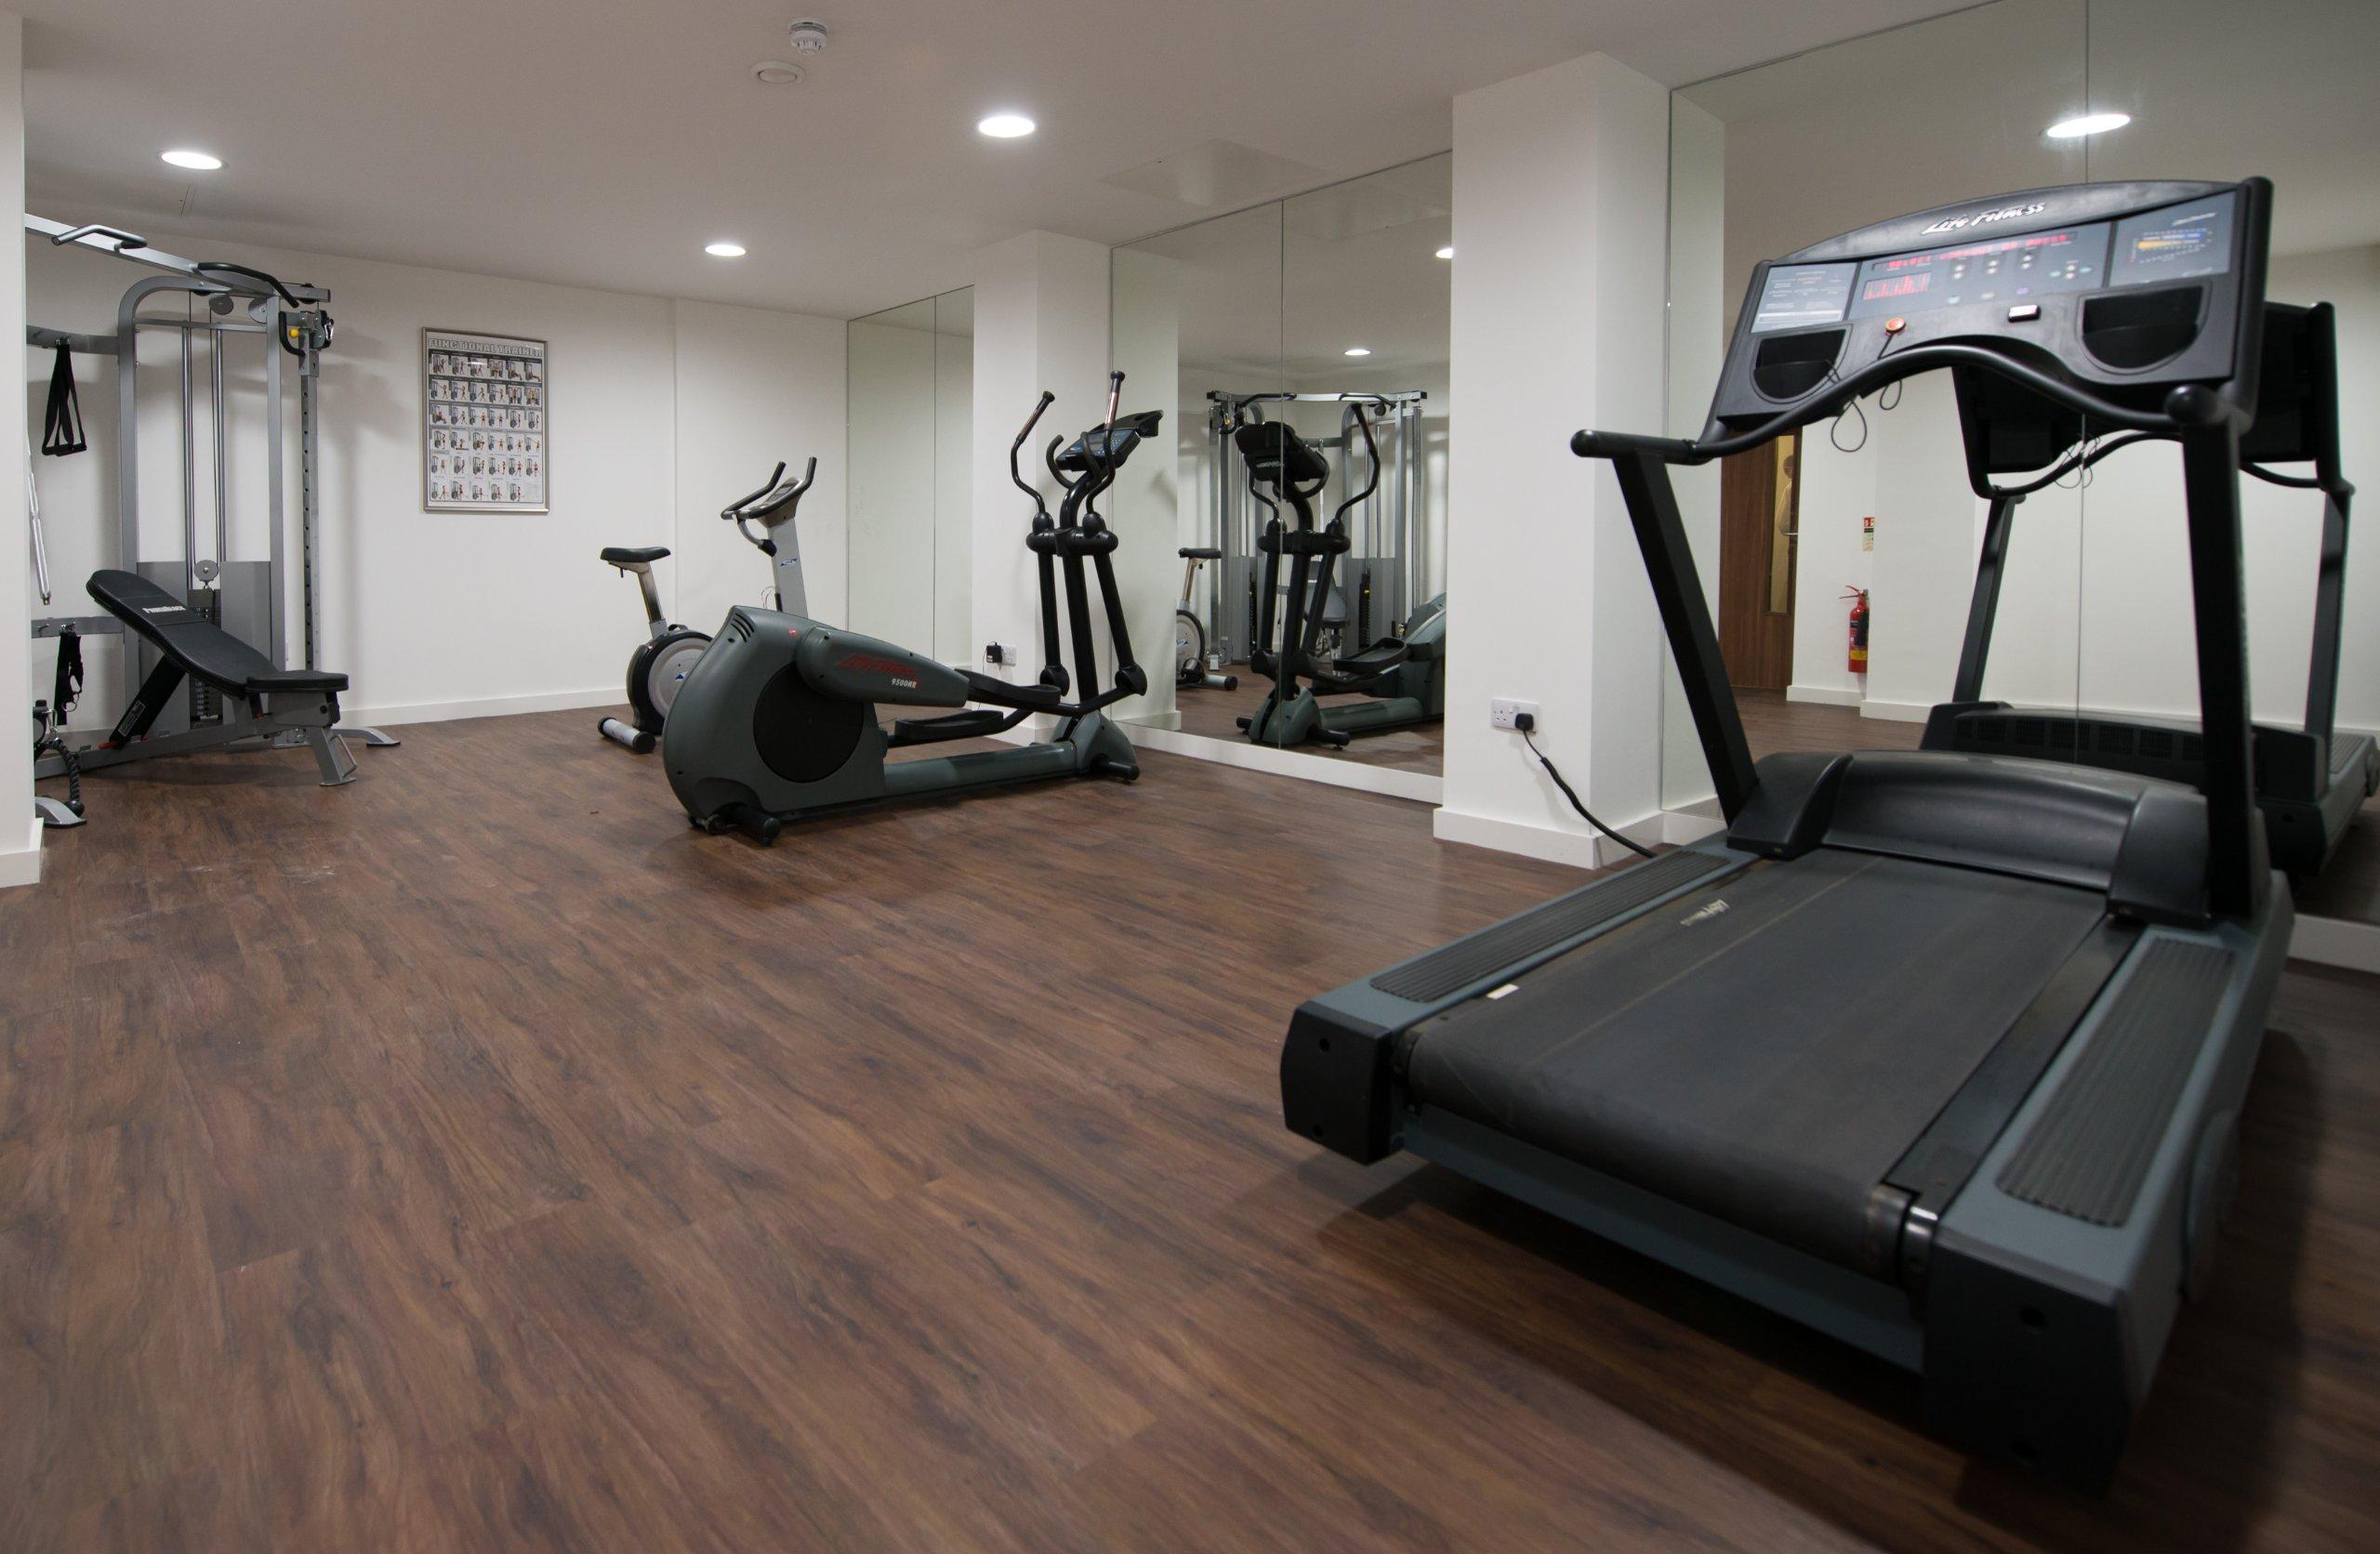 Student Accommodation Gym